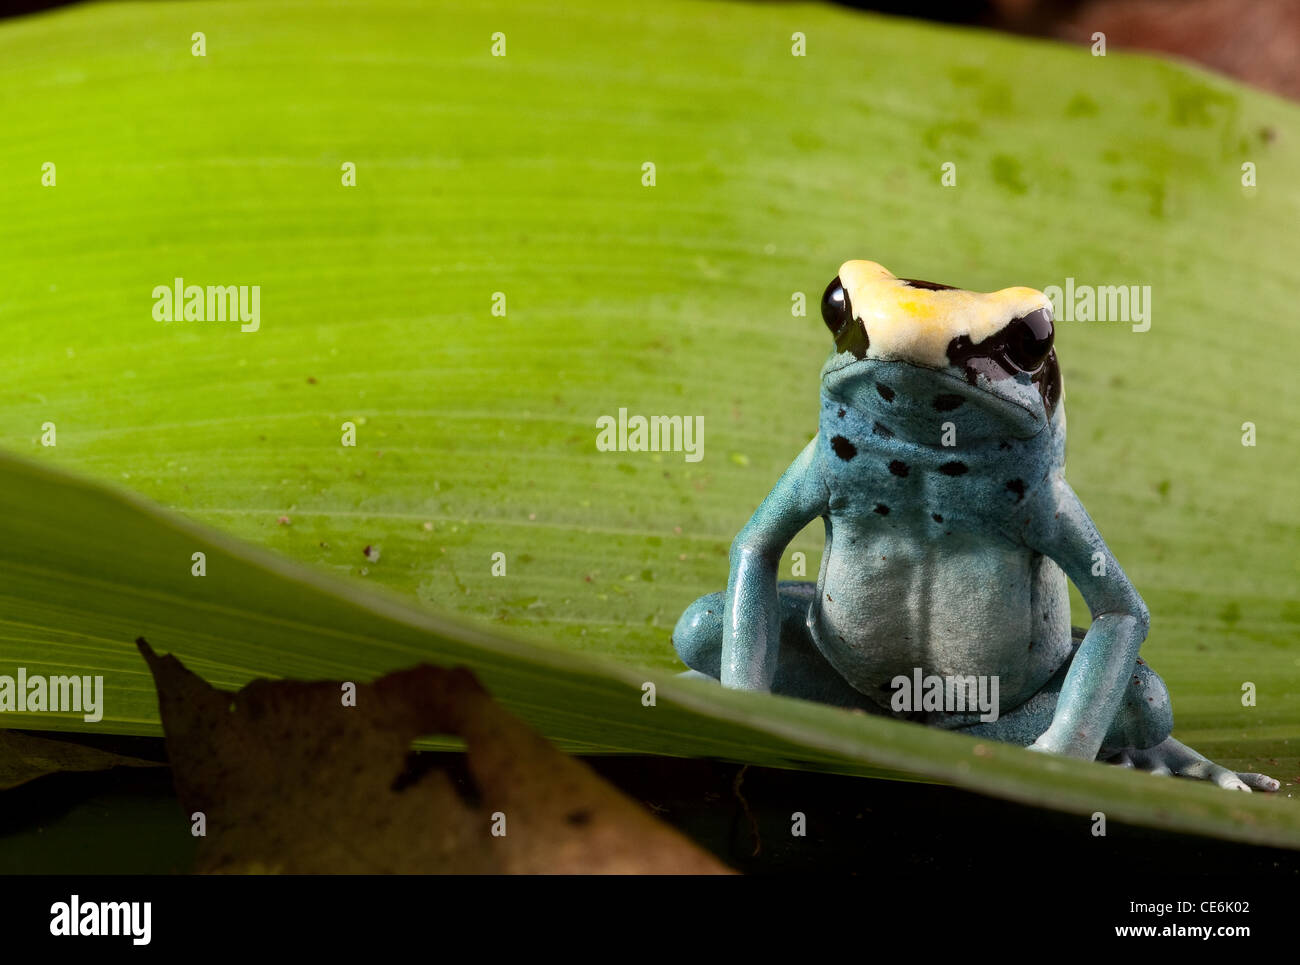 poison frog, Dendrobates tinctorius tropical rainforest animal on green leaf - Stock Image